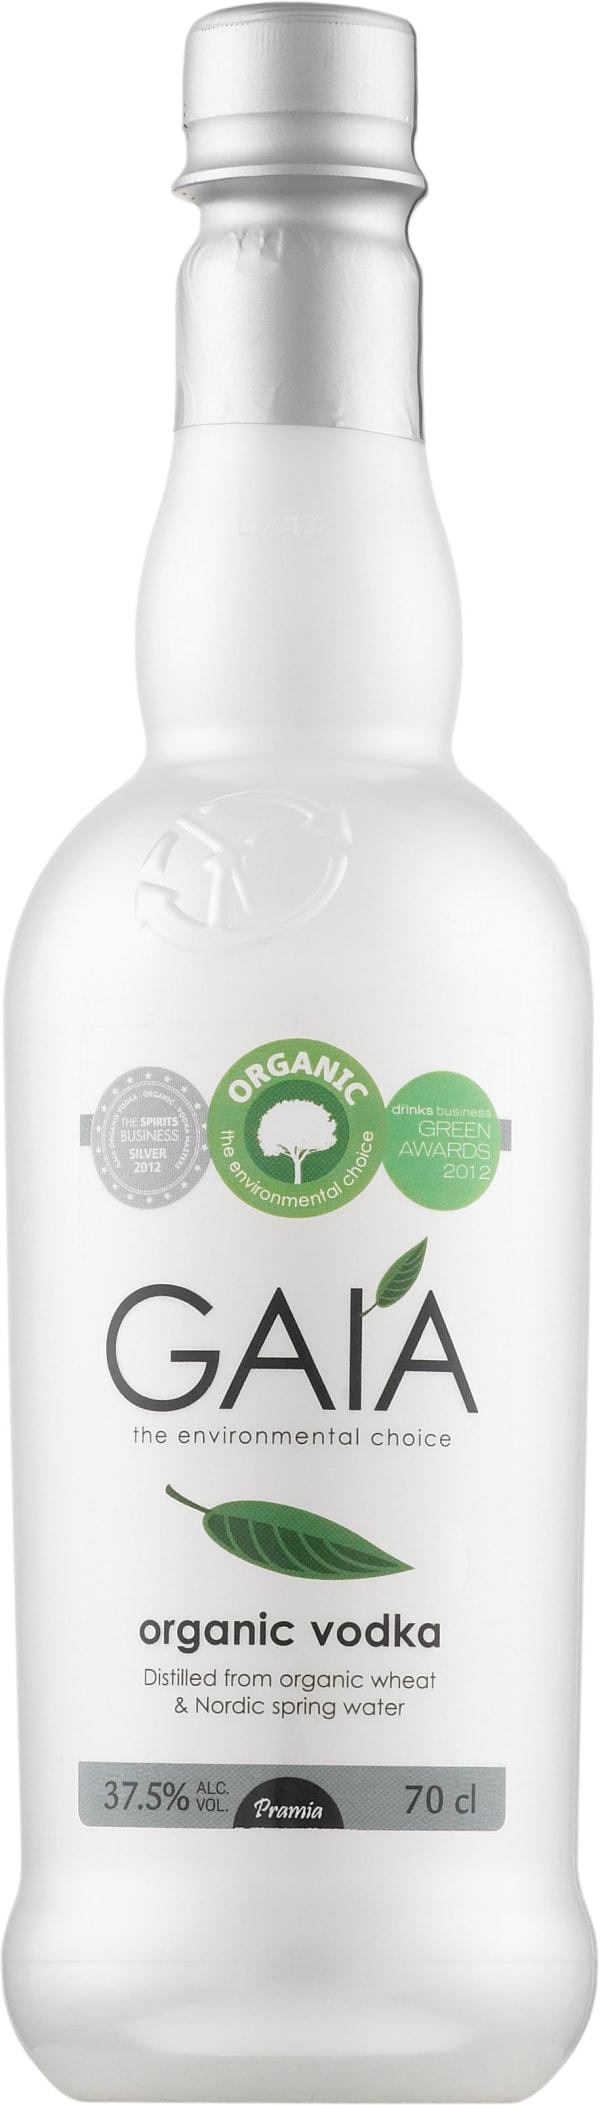 Gaía Organic Vodka plastic bottle